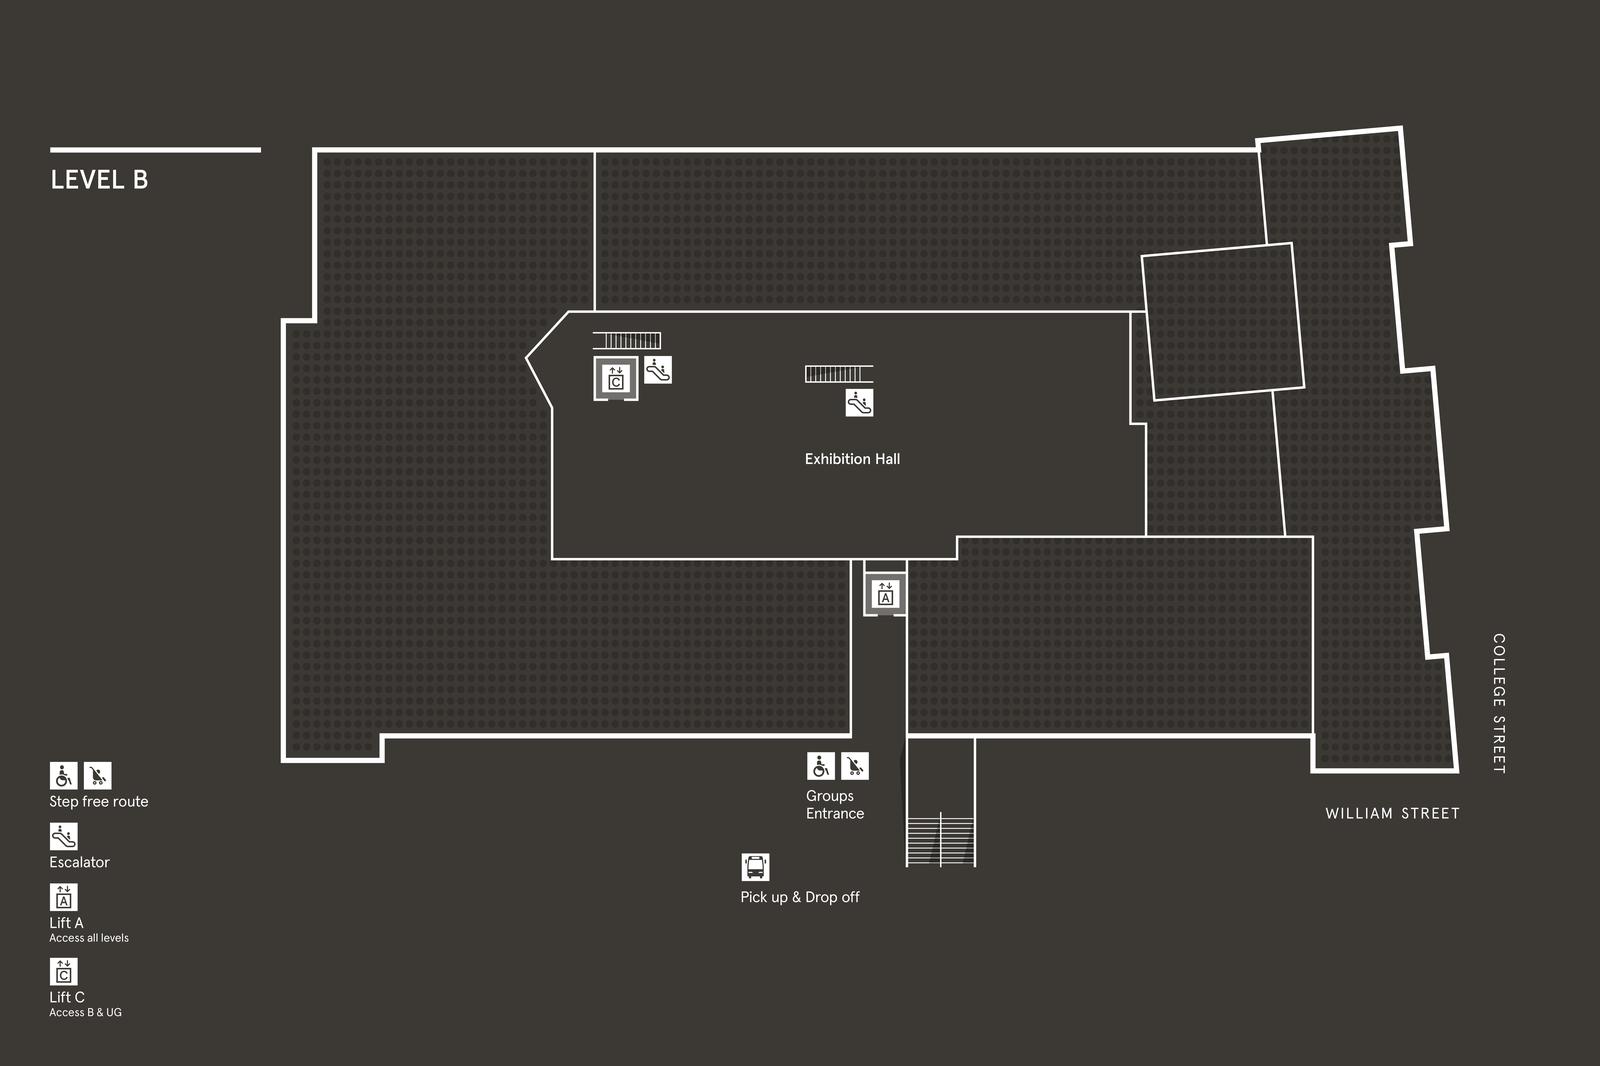 AM Map - Level B